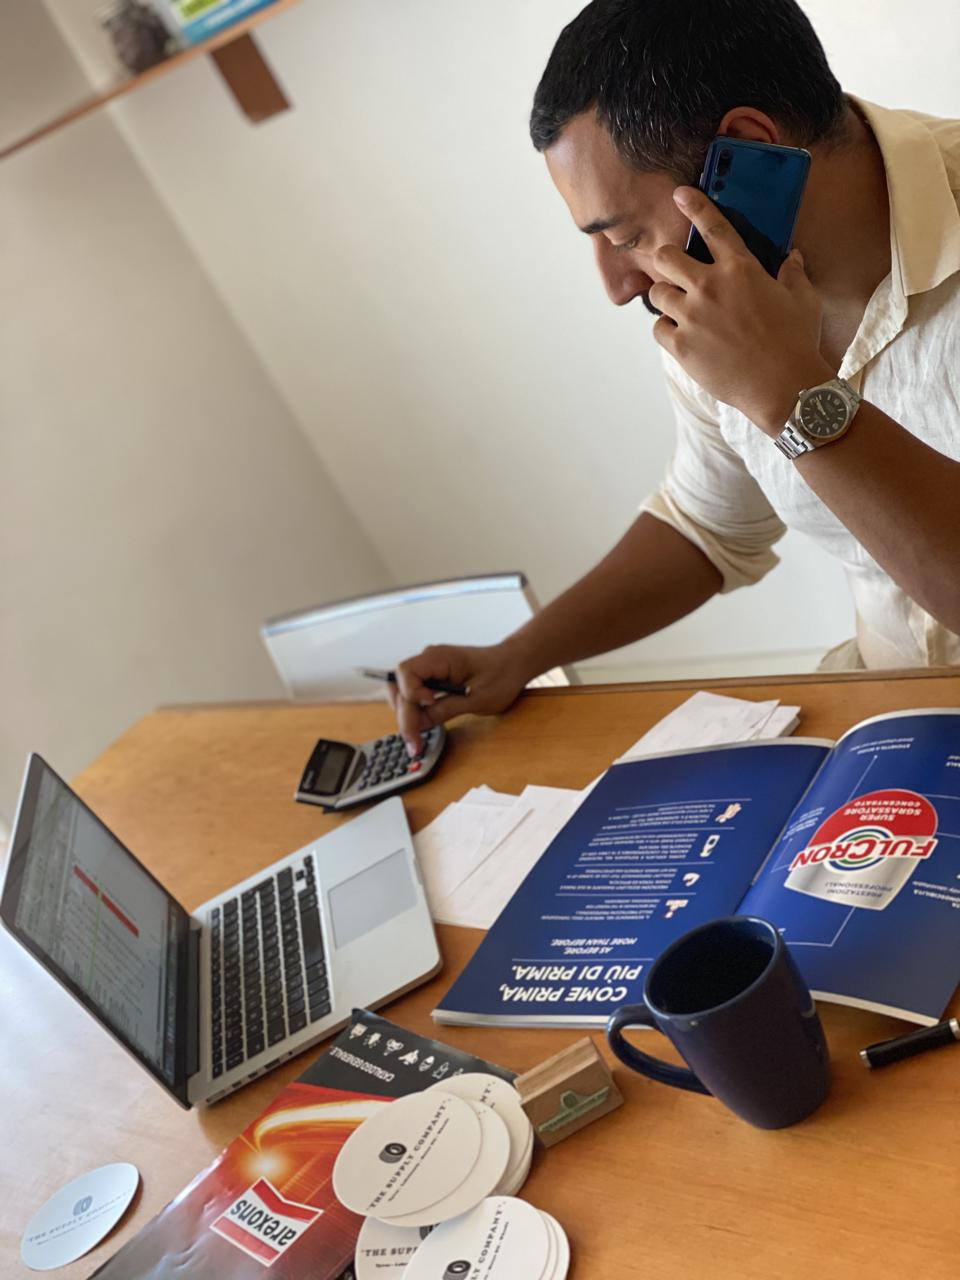 Salah el Busefi, founder of The Supply Company, at work at his desk.